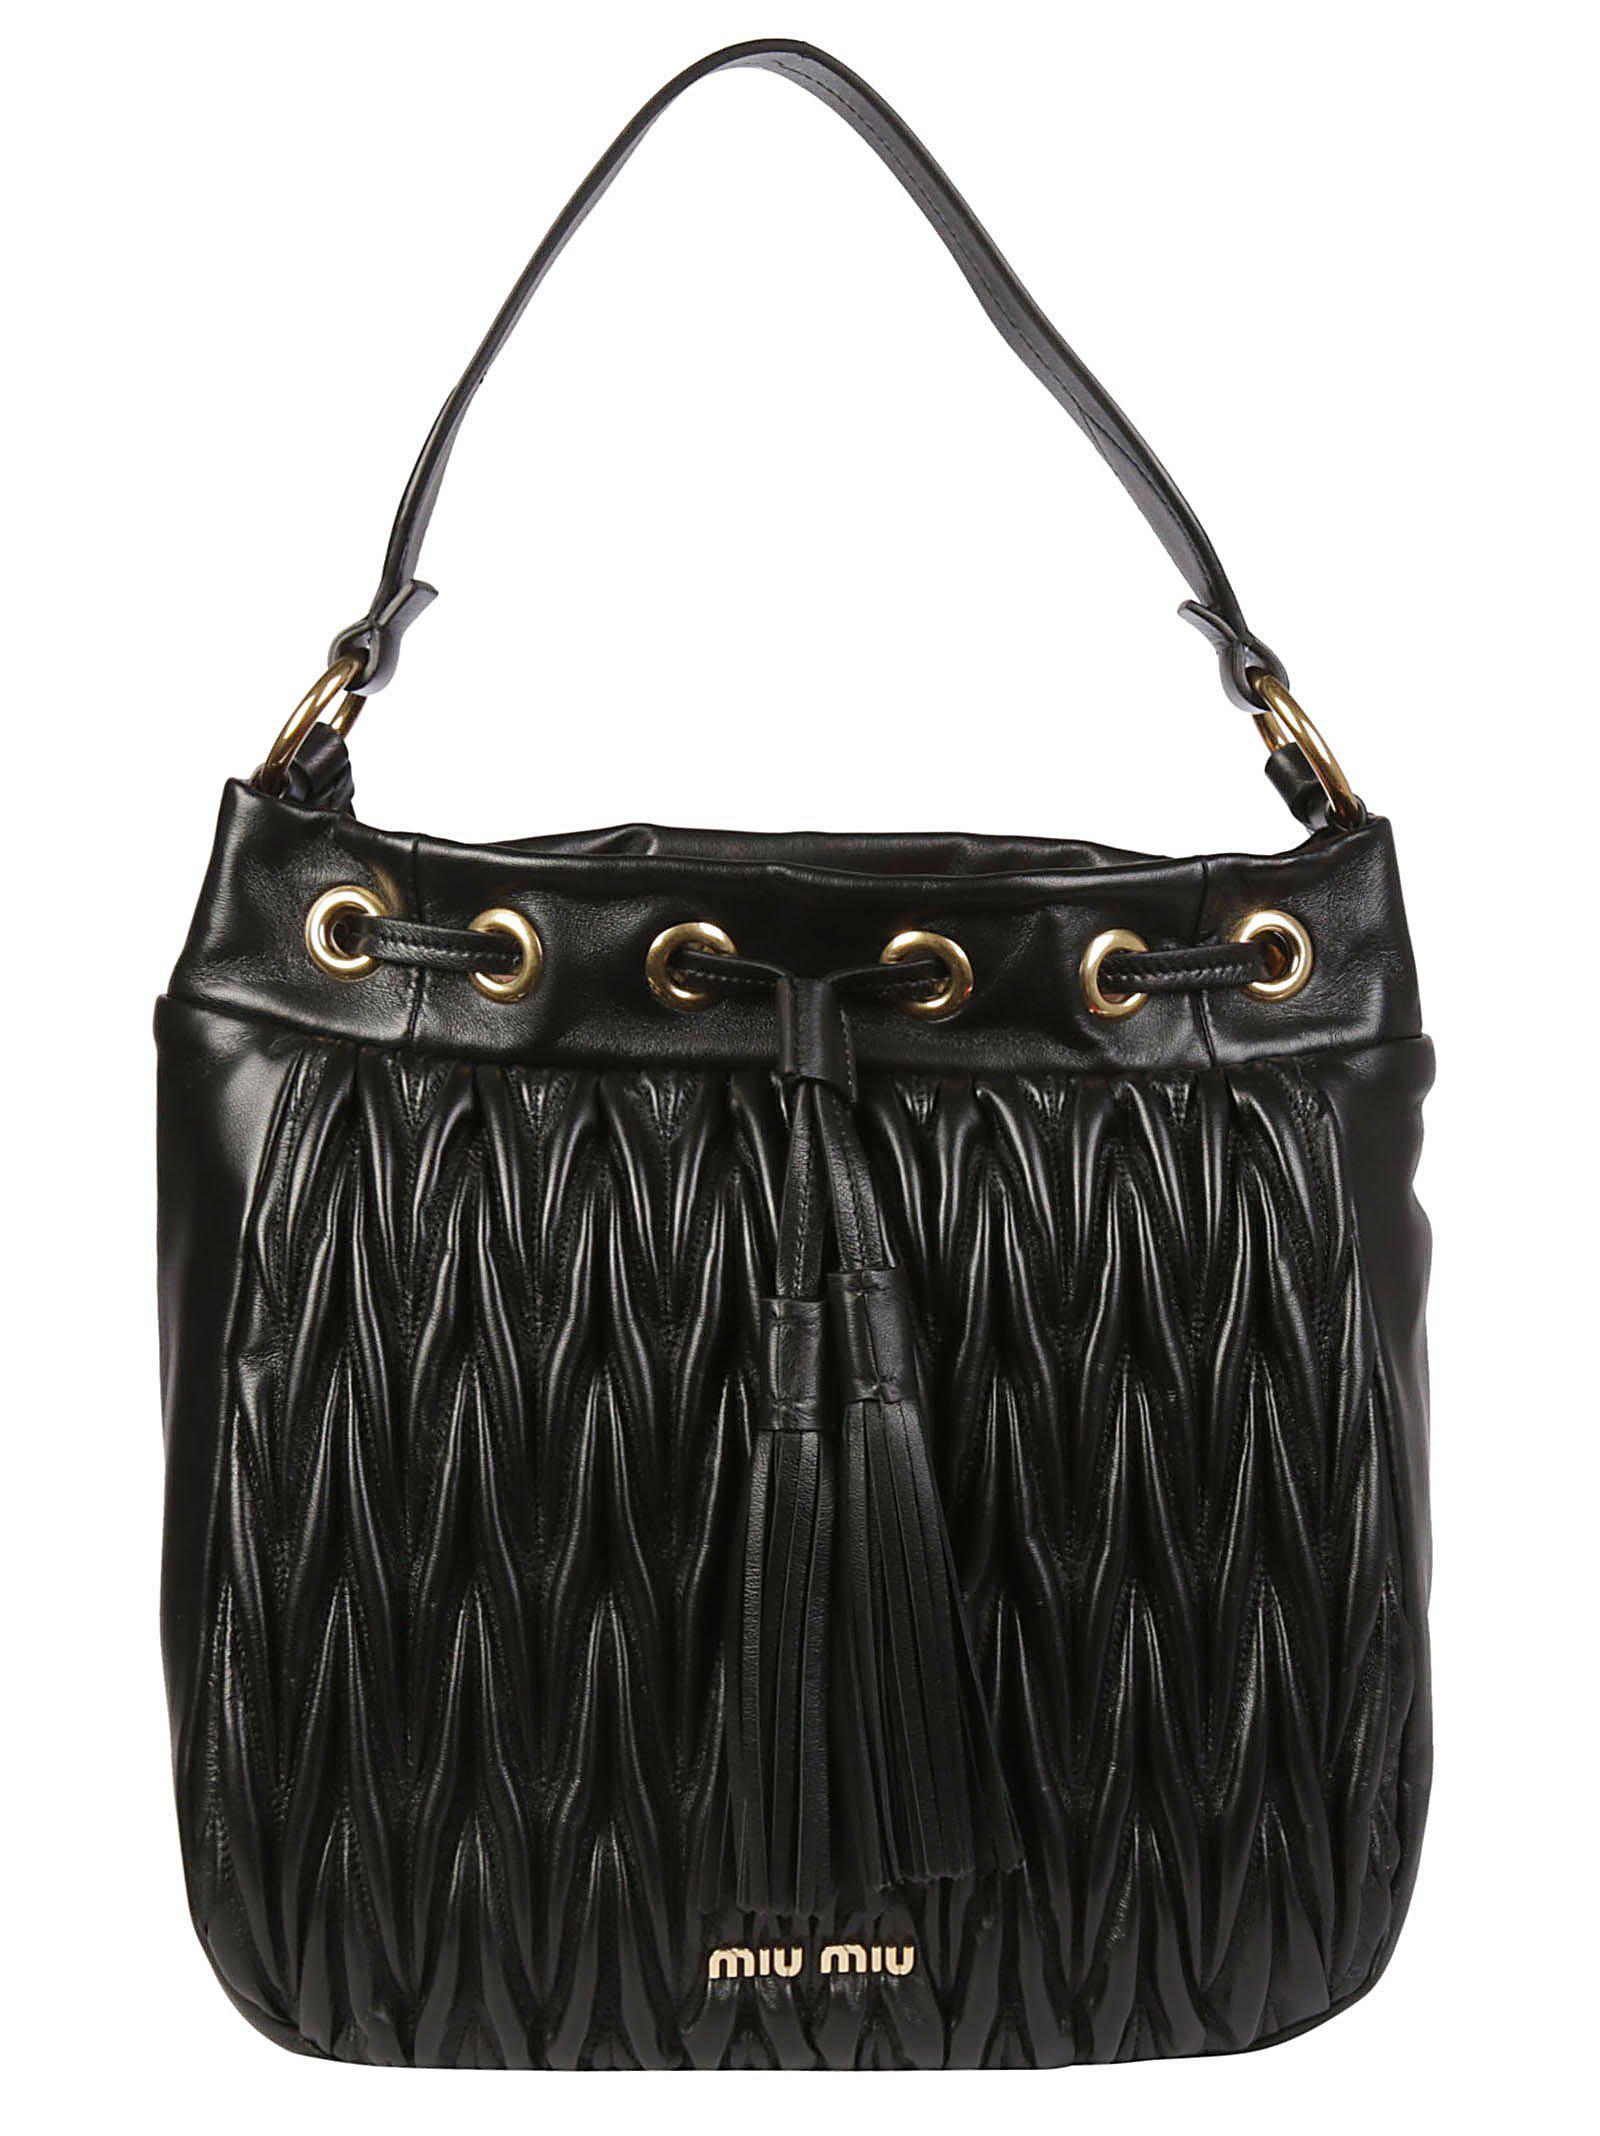 78aba779a105 Lyst - Miu Miu Matelassé Tassel Tote Bag in Black